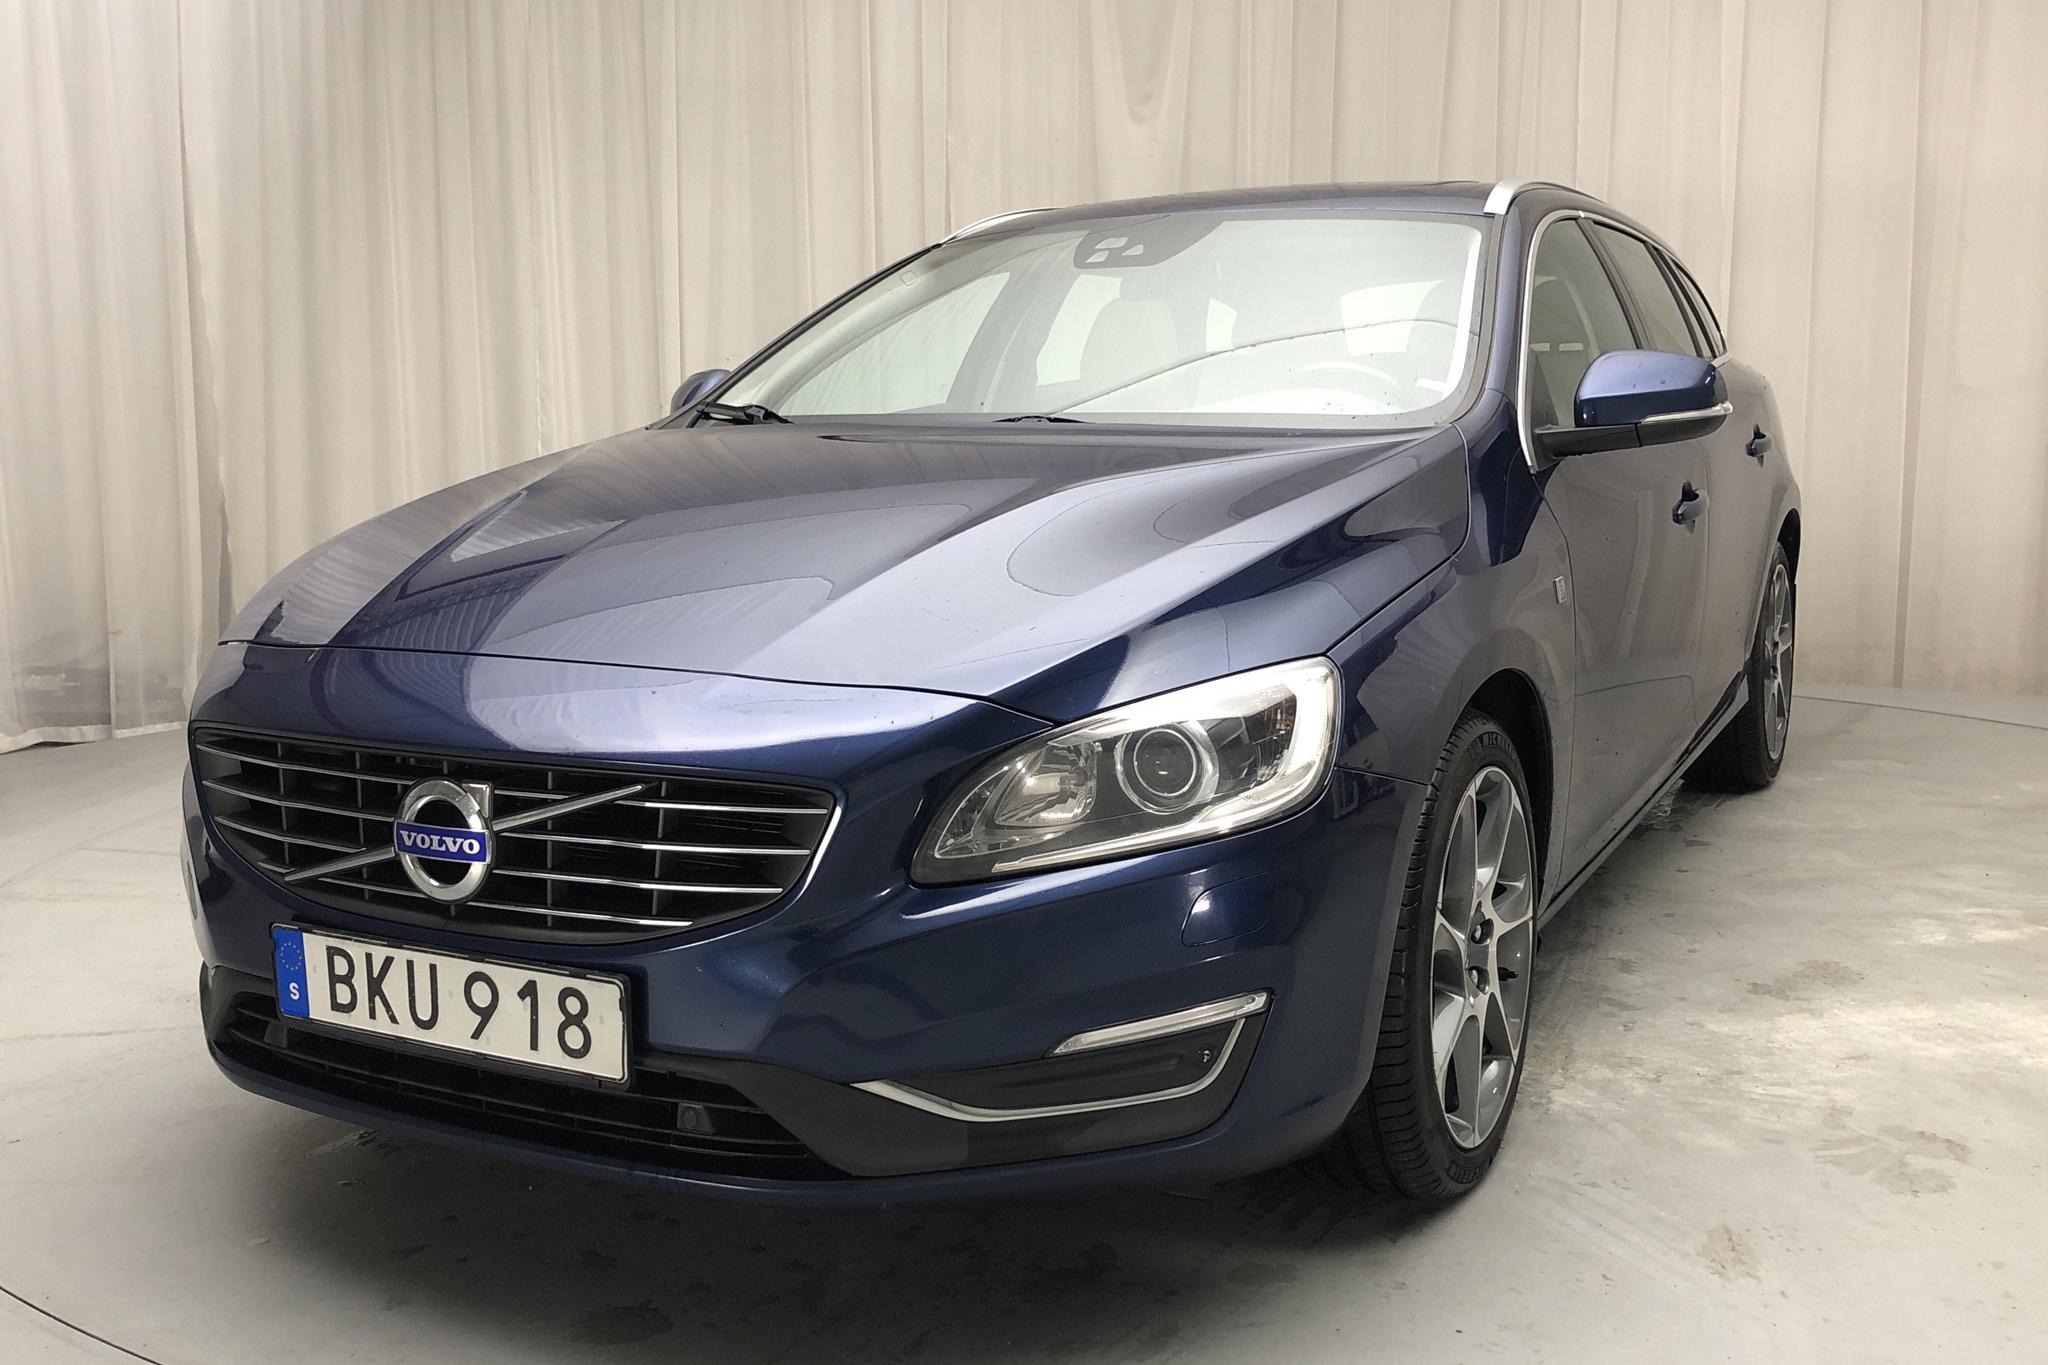 Volvo V60 T5 (245hk) - 215 290 km - Automatic - blue - 2015